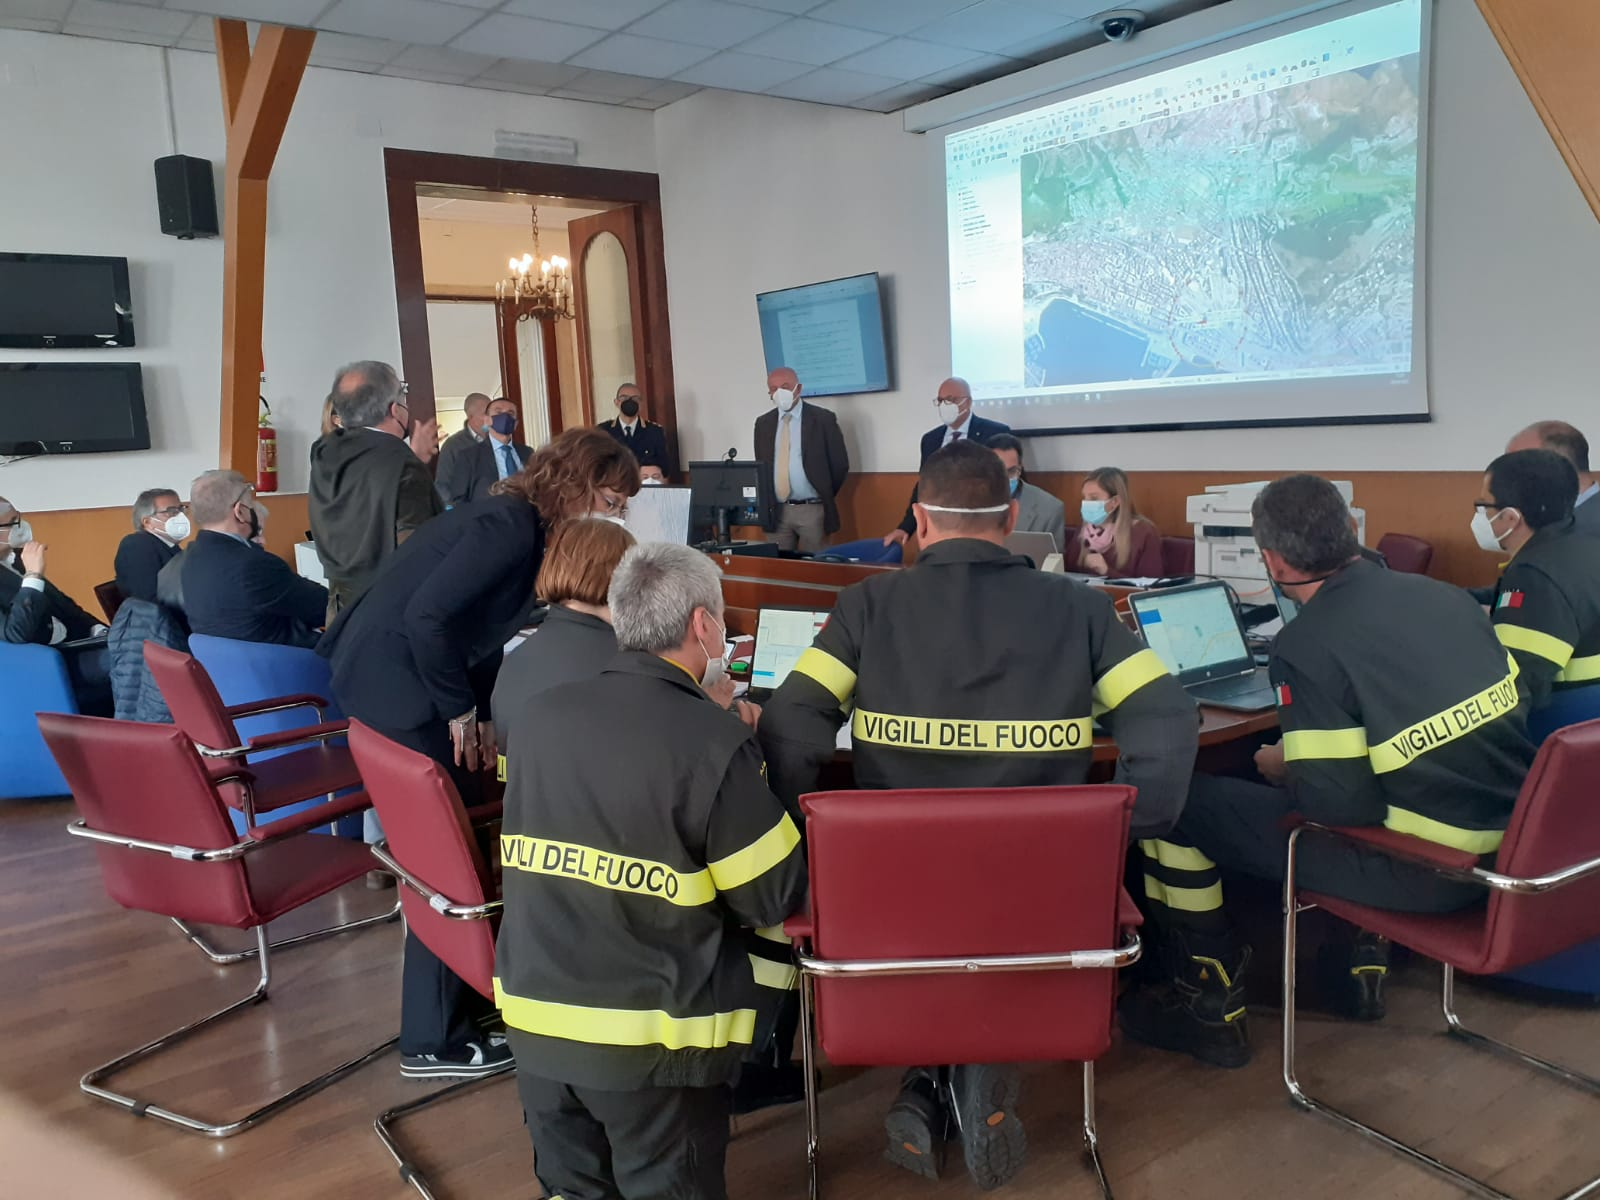 Salerno: esercitazione di difesa civile in Prefettura